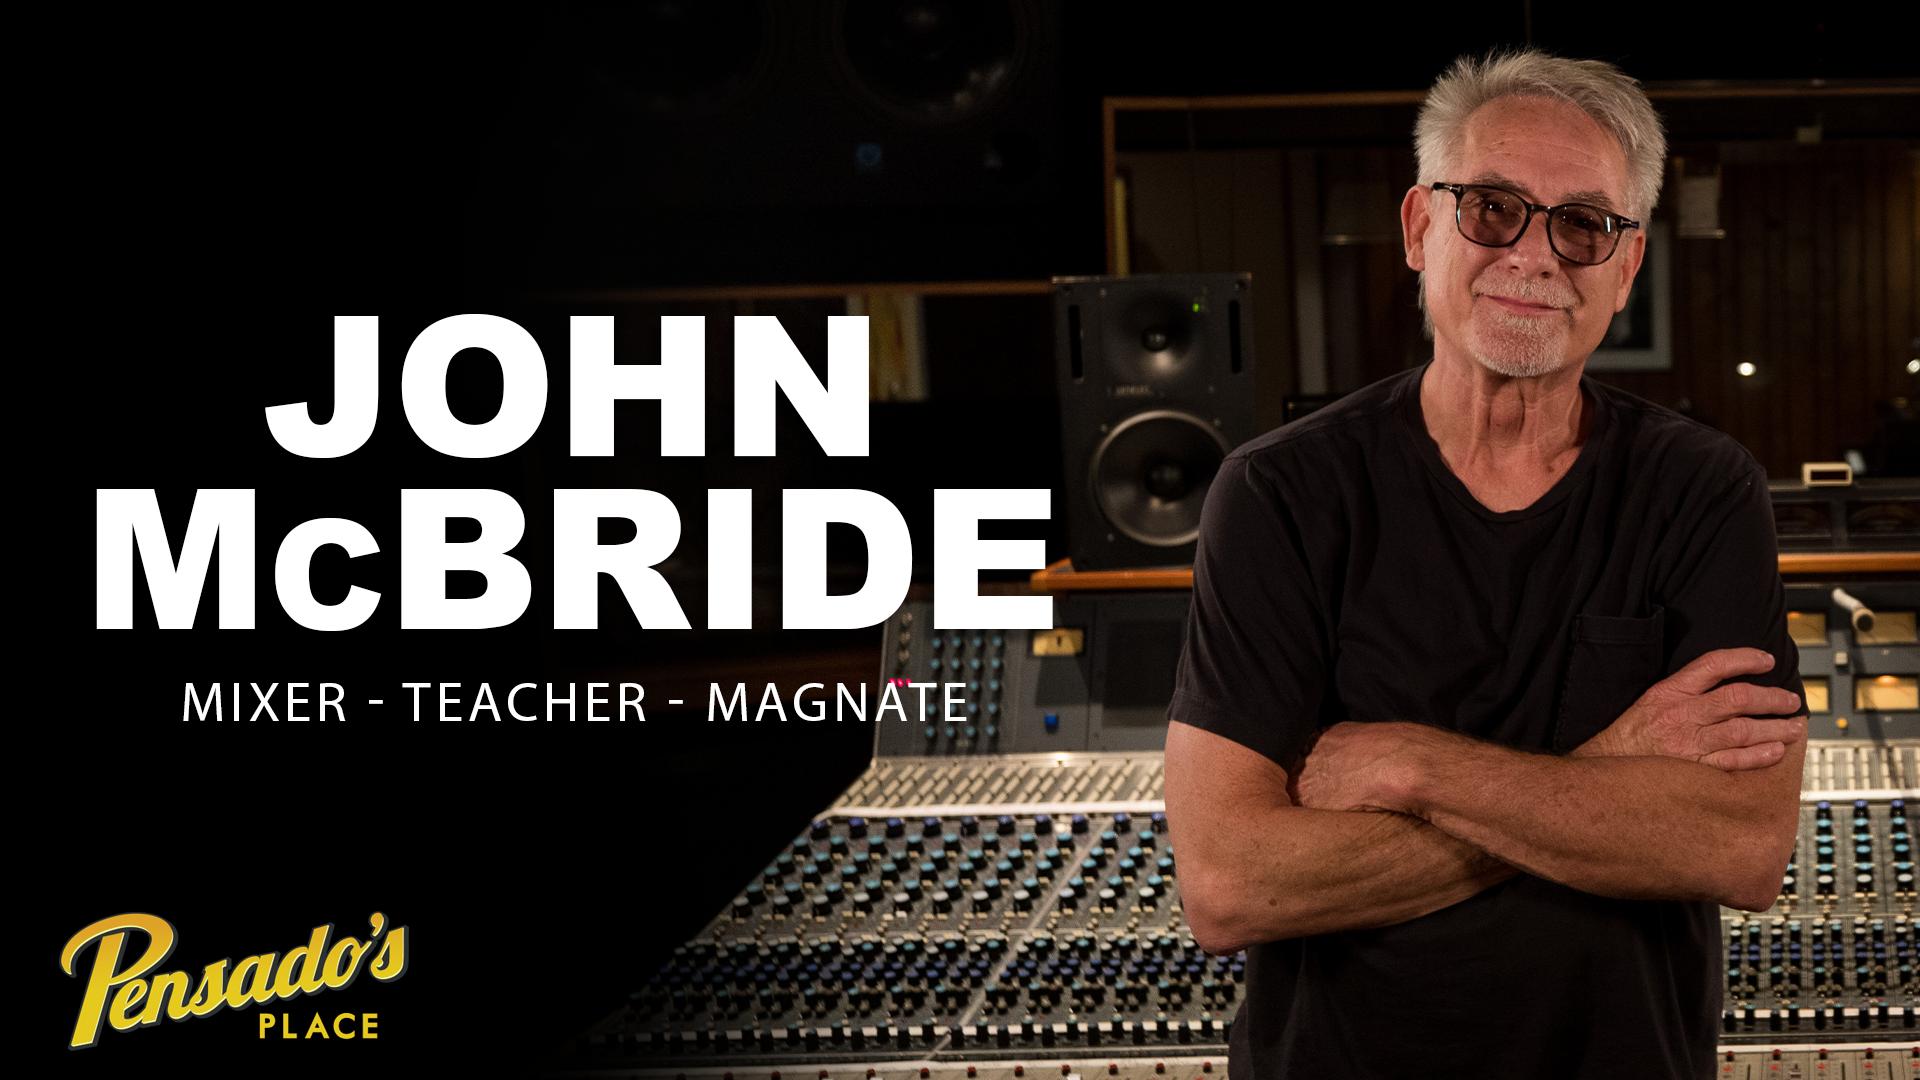 Mixer / Teacher / Magnate, John McBride